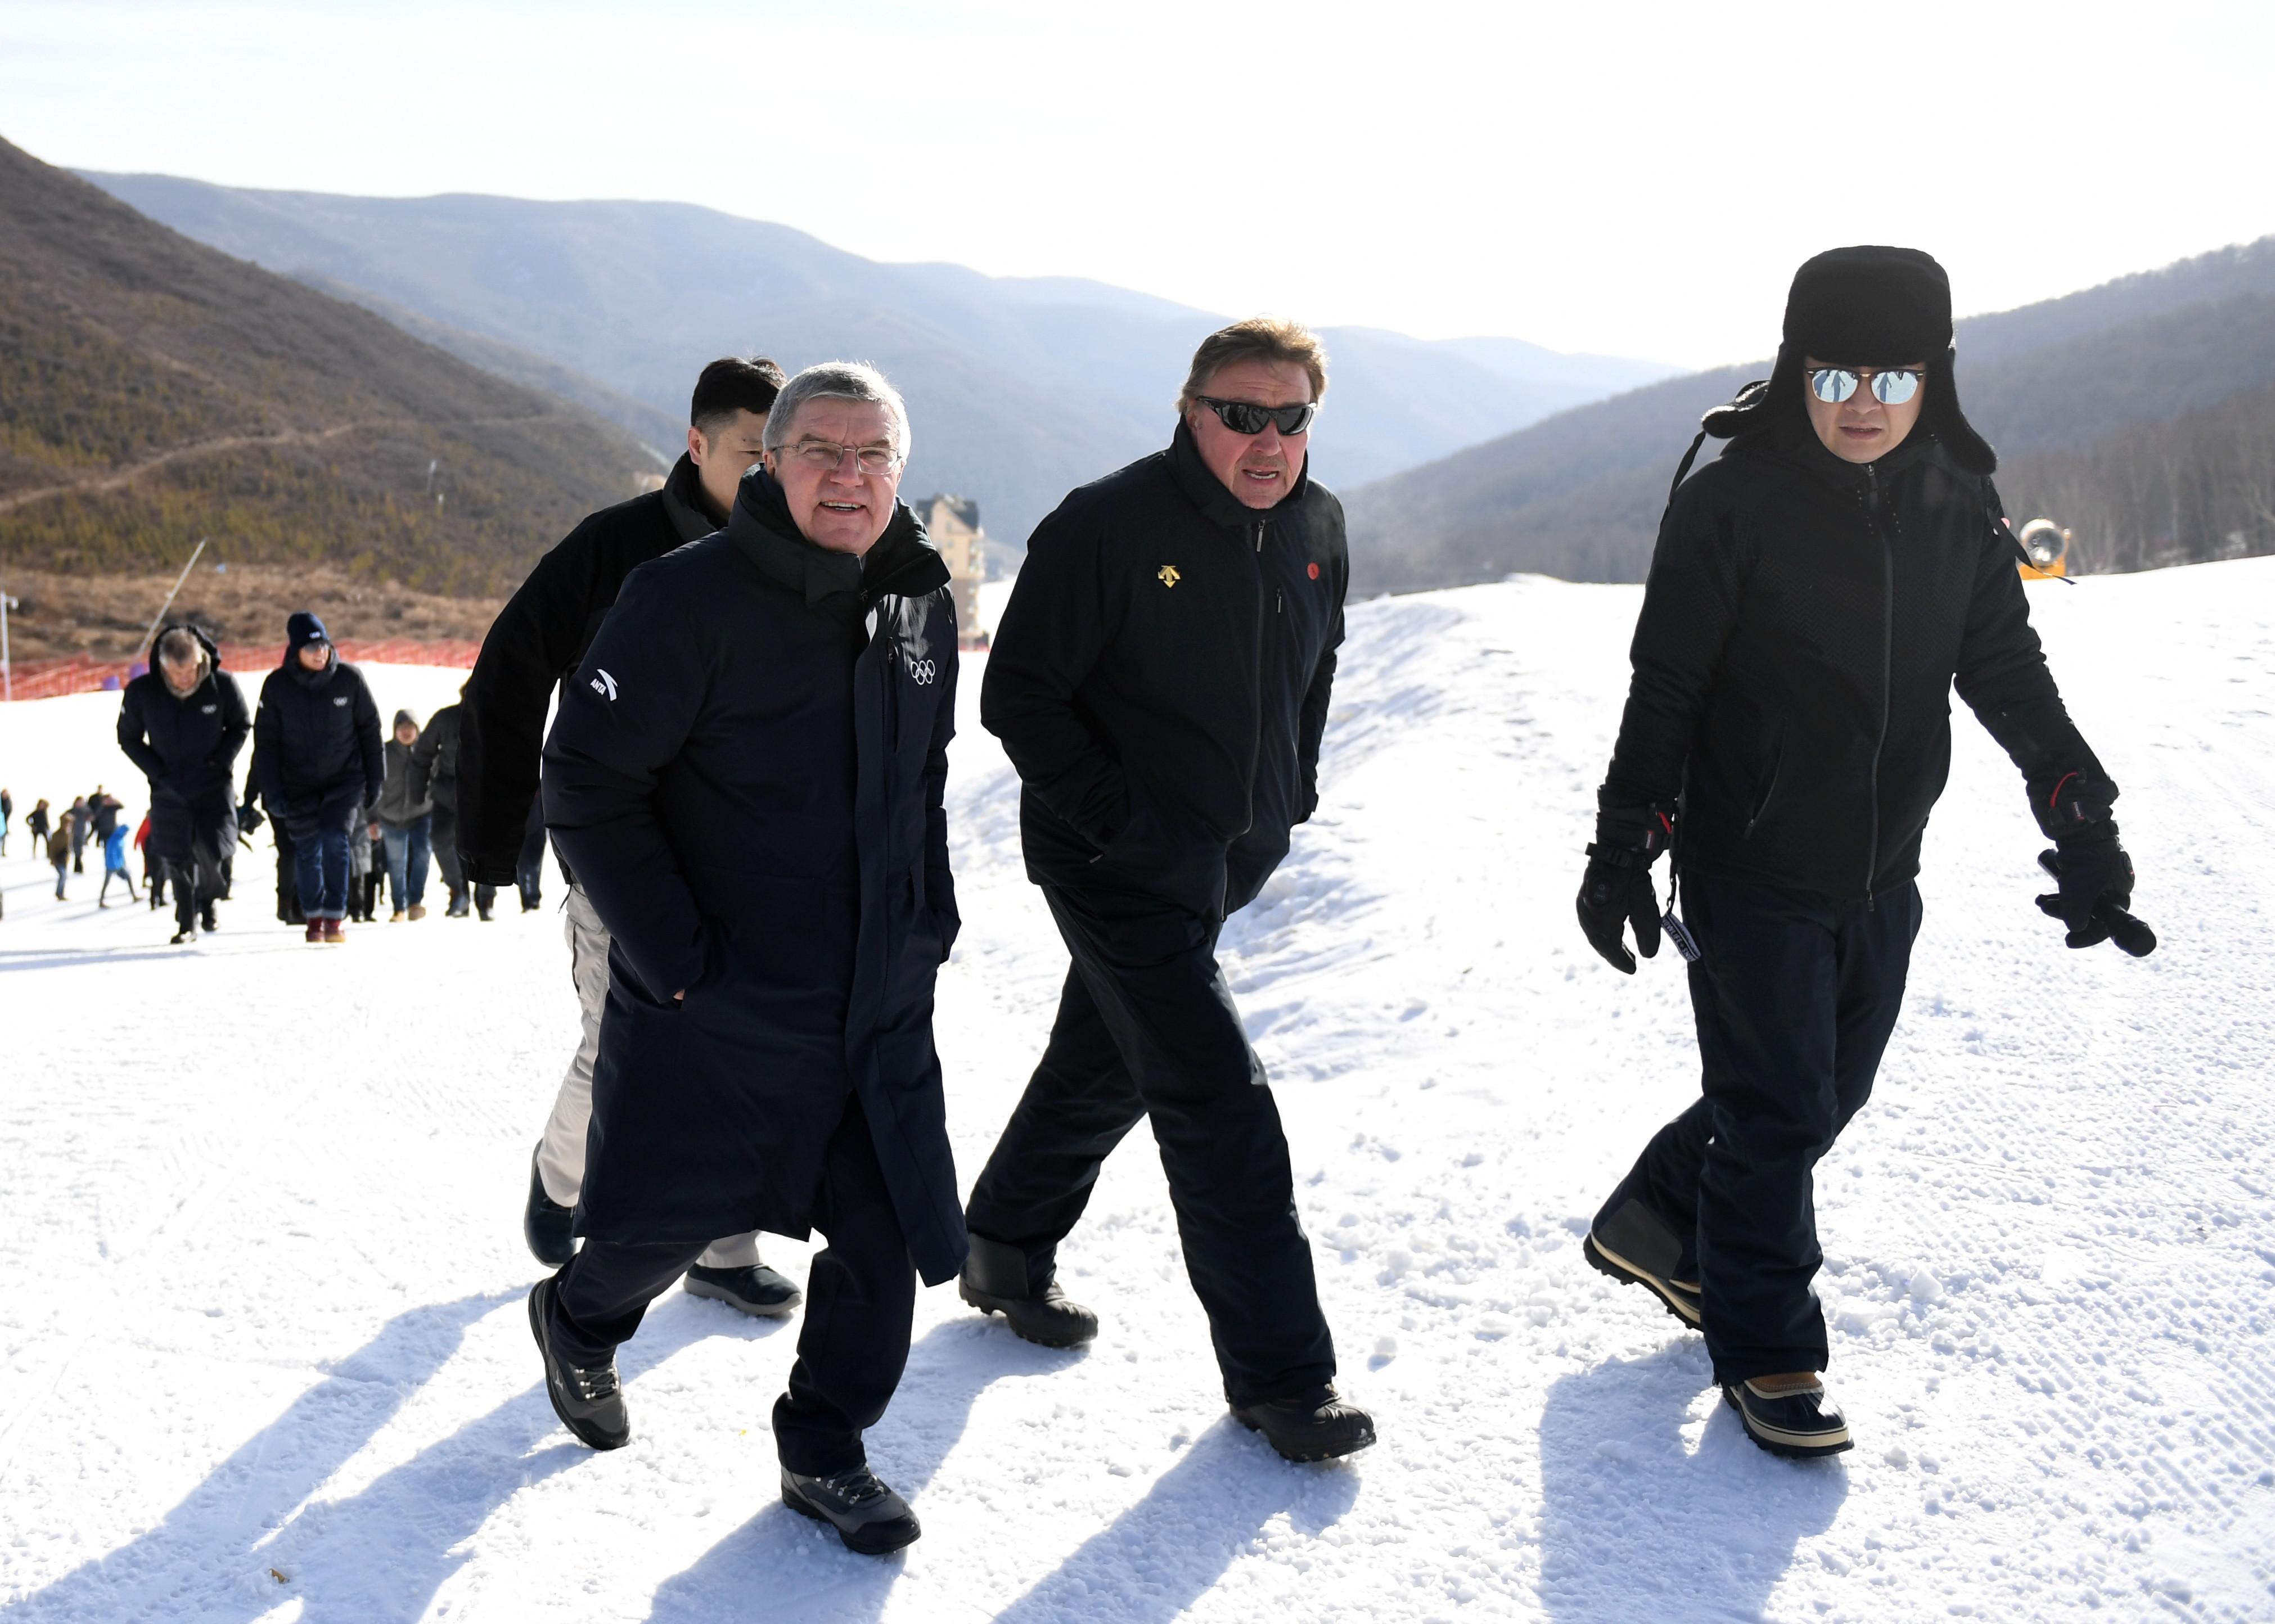 IOC会長、2022年北京冬季五輪の準備状況を視察